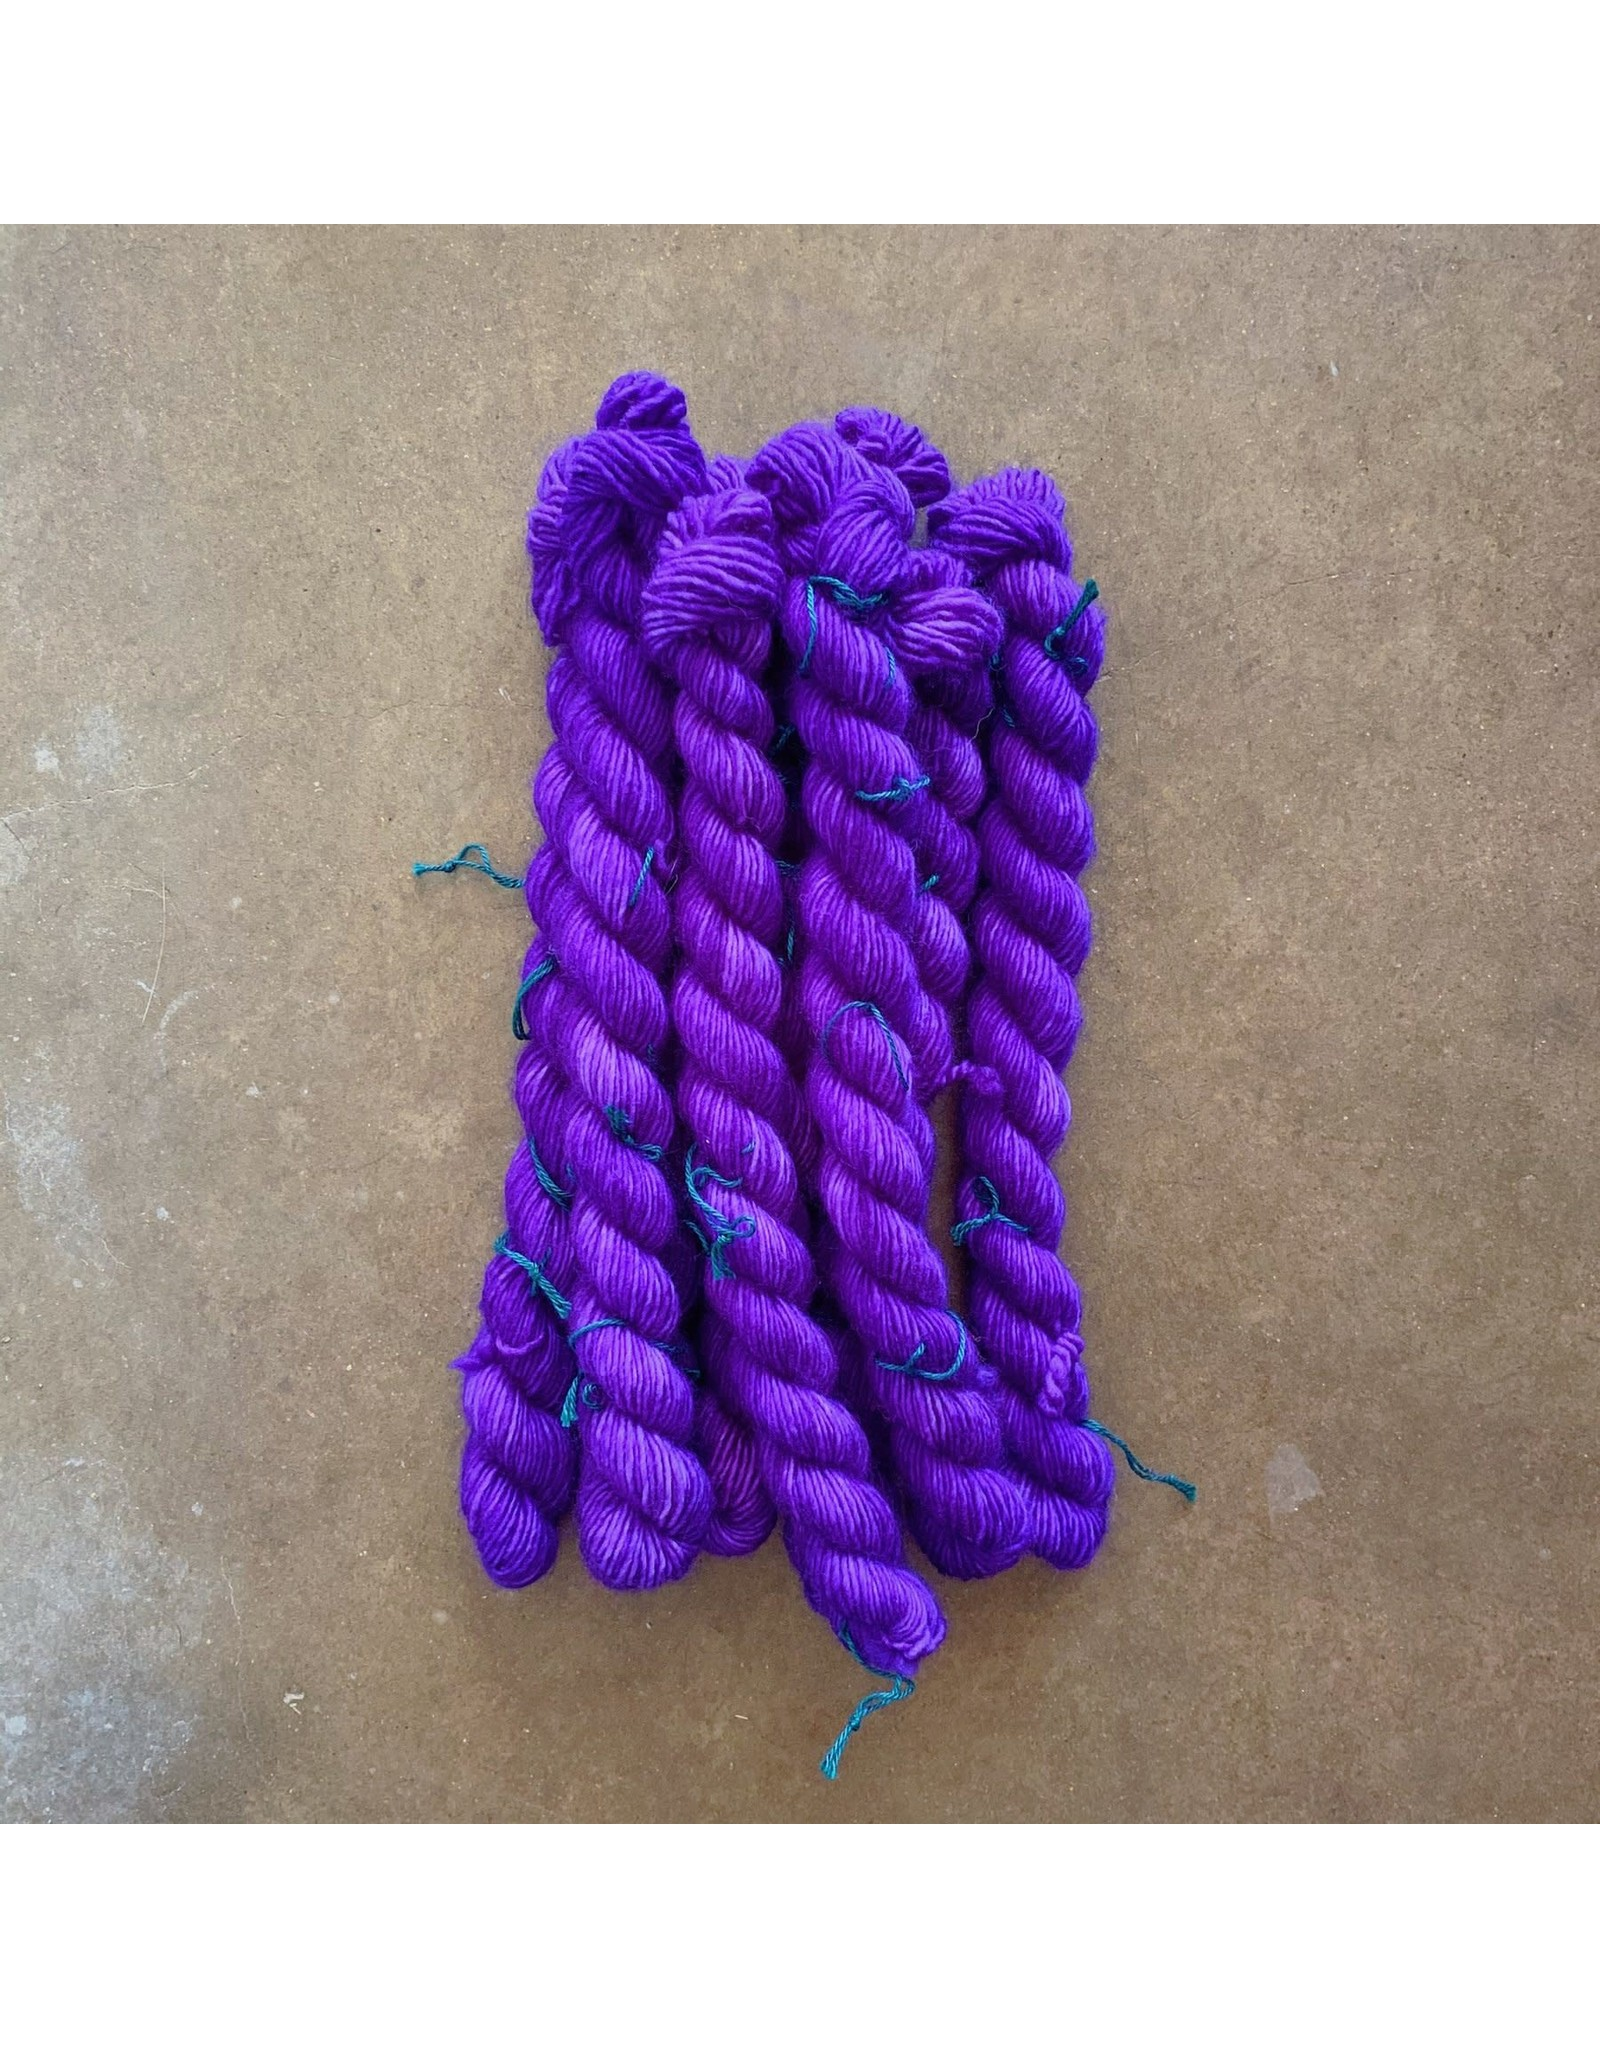 Ultramarine Violet - Unicorn Tails - Madelinetosh